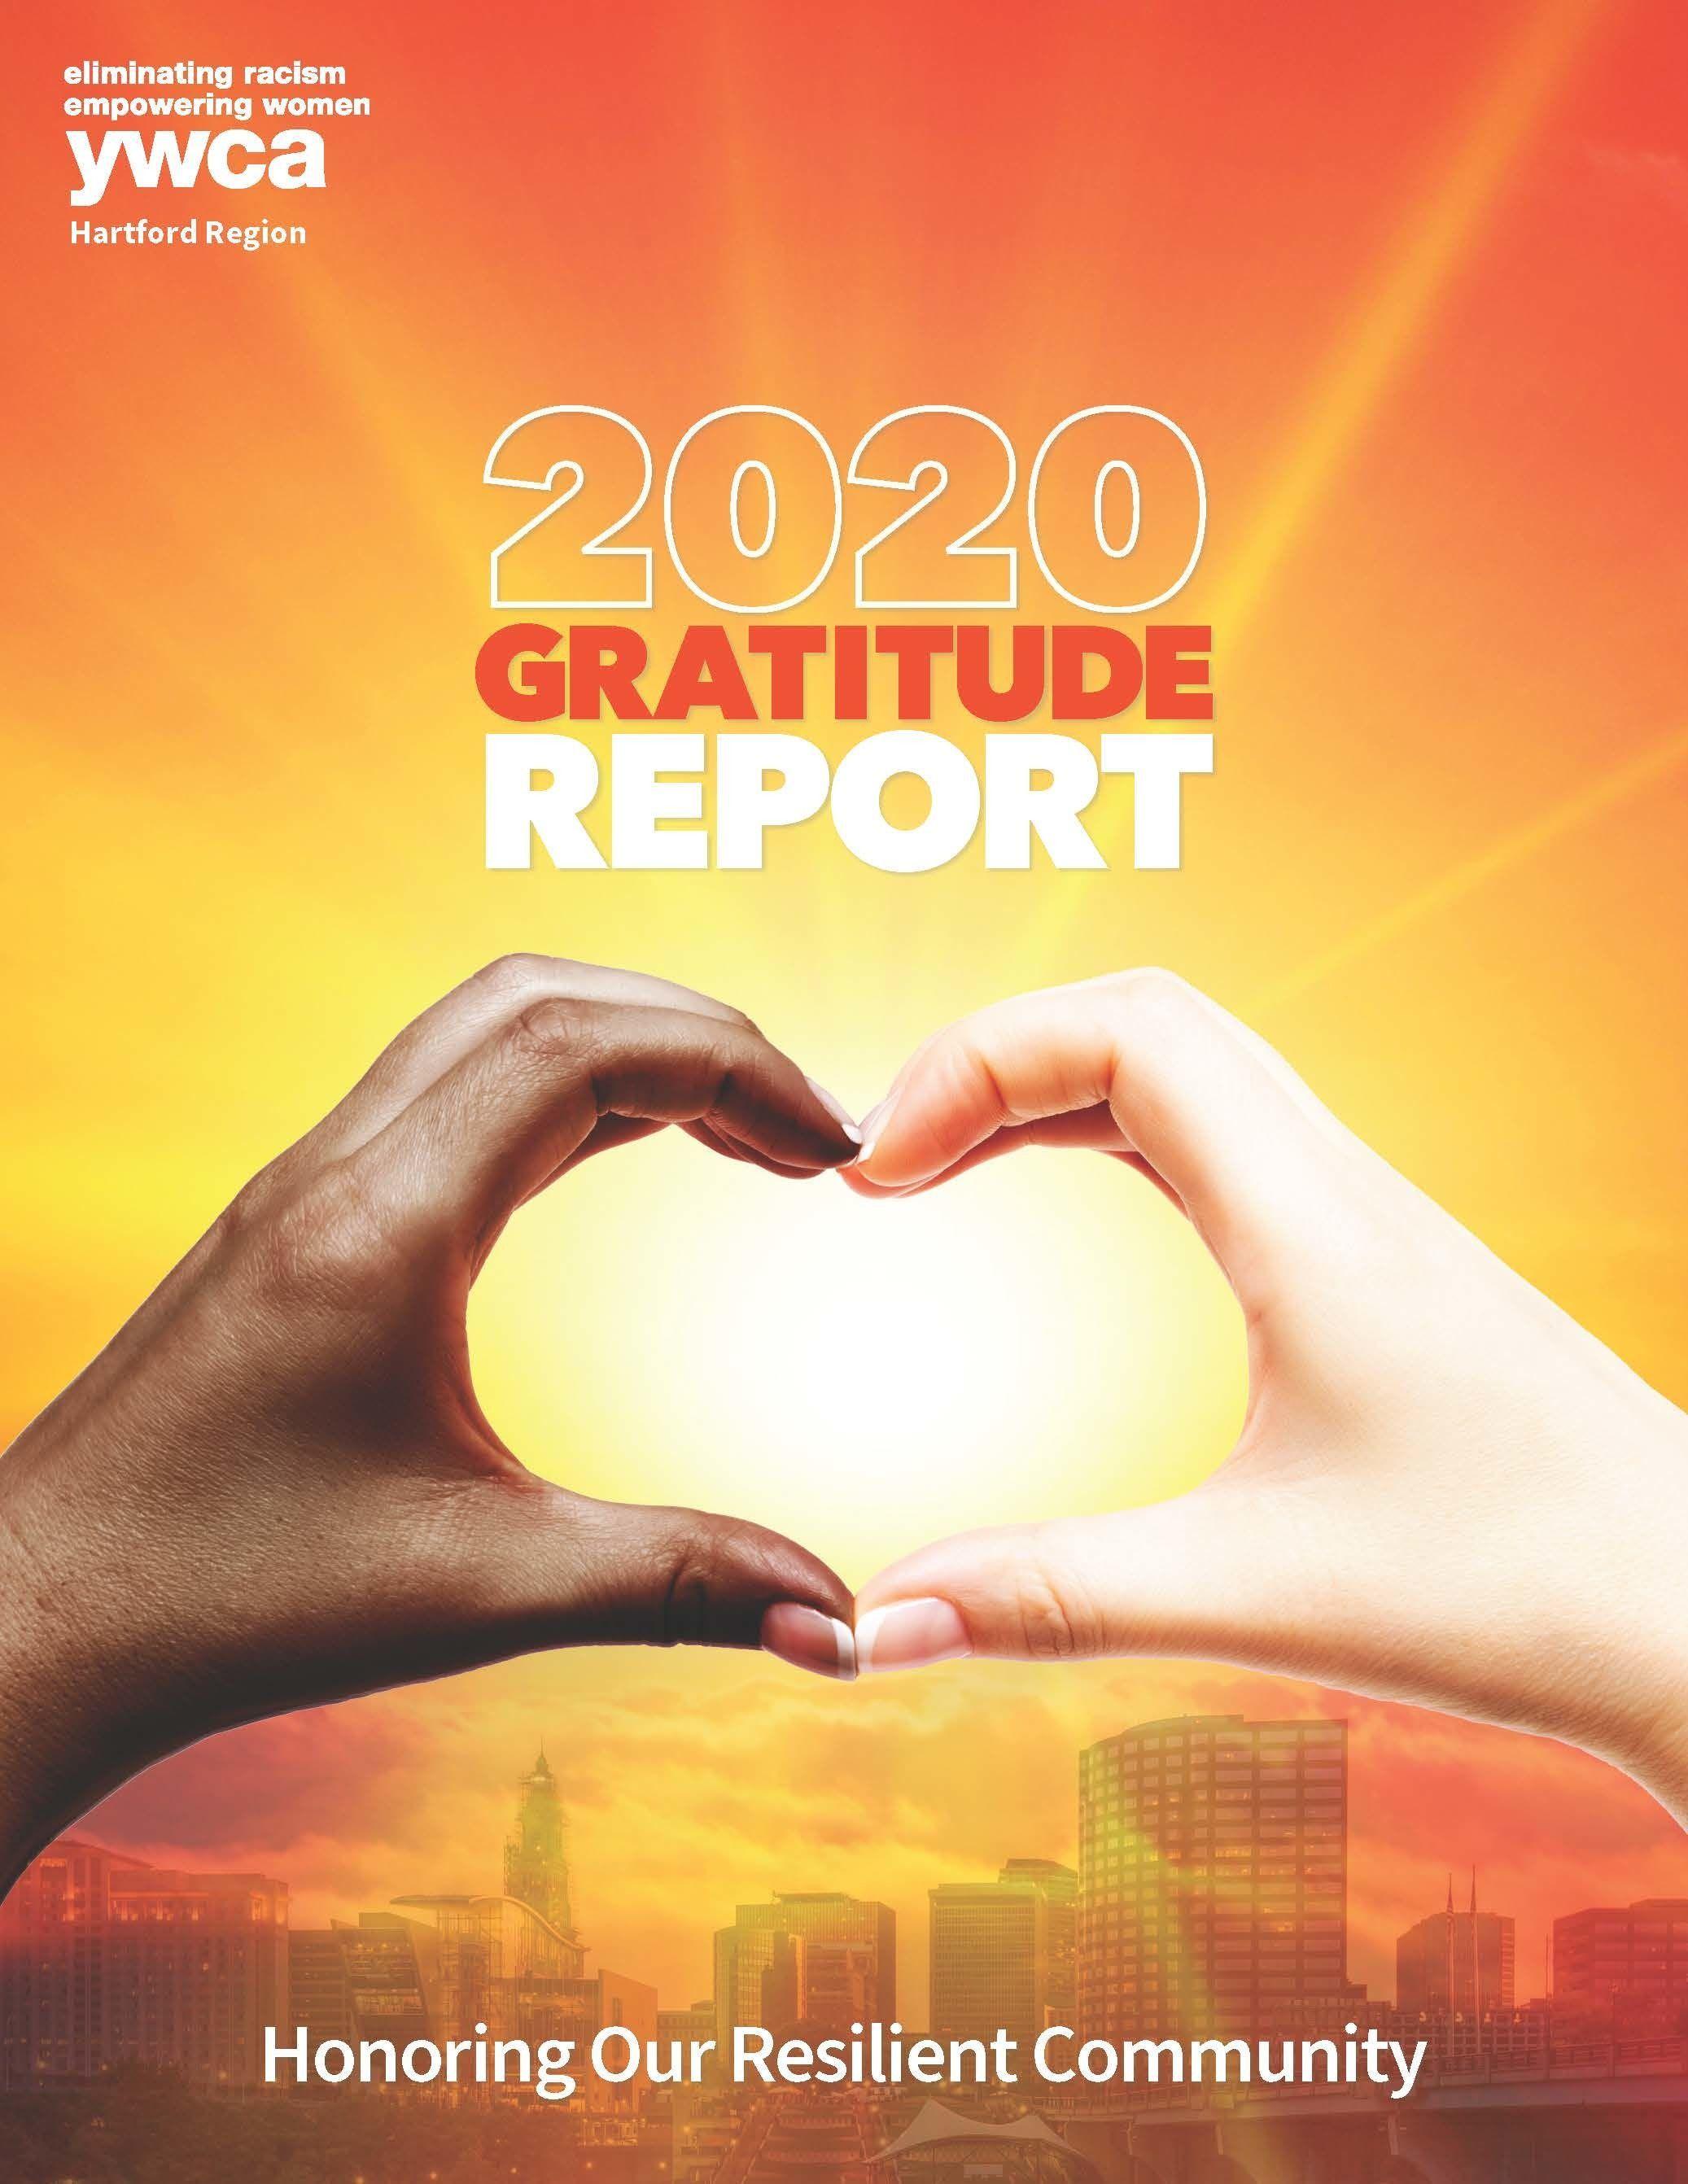 2020 Gratitude Report